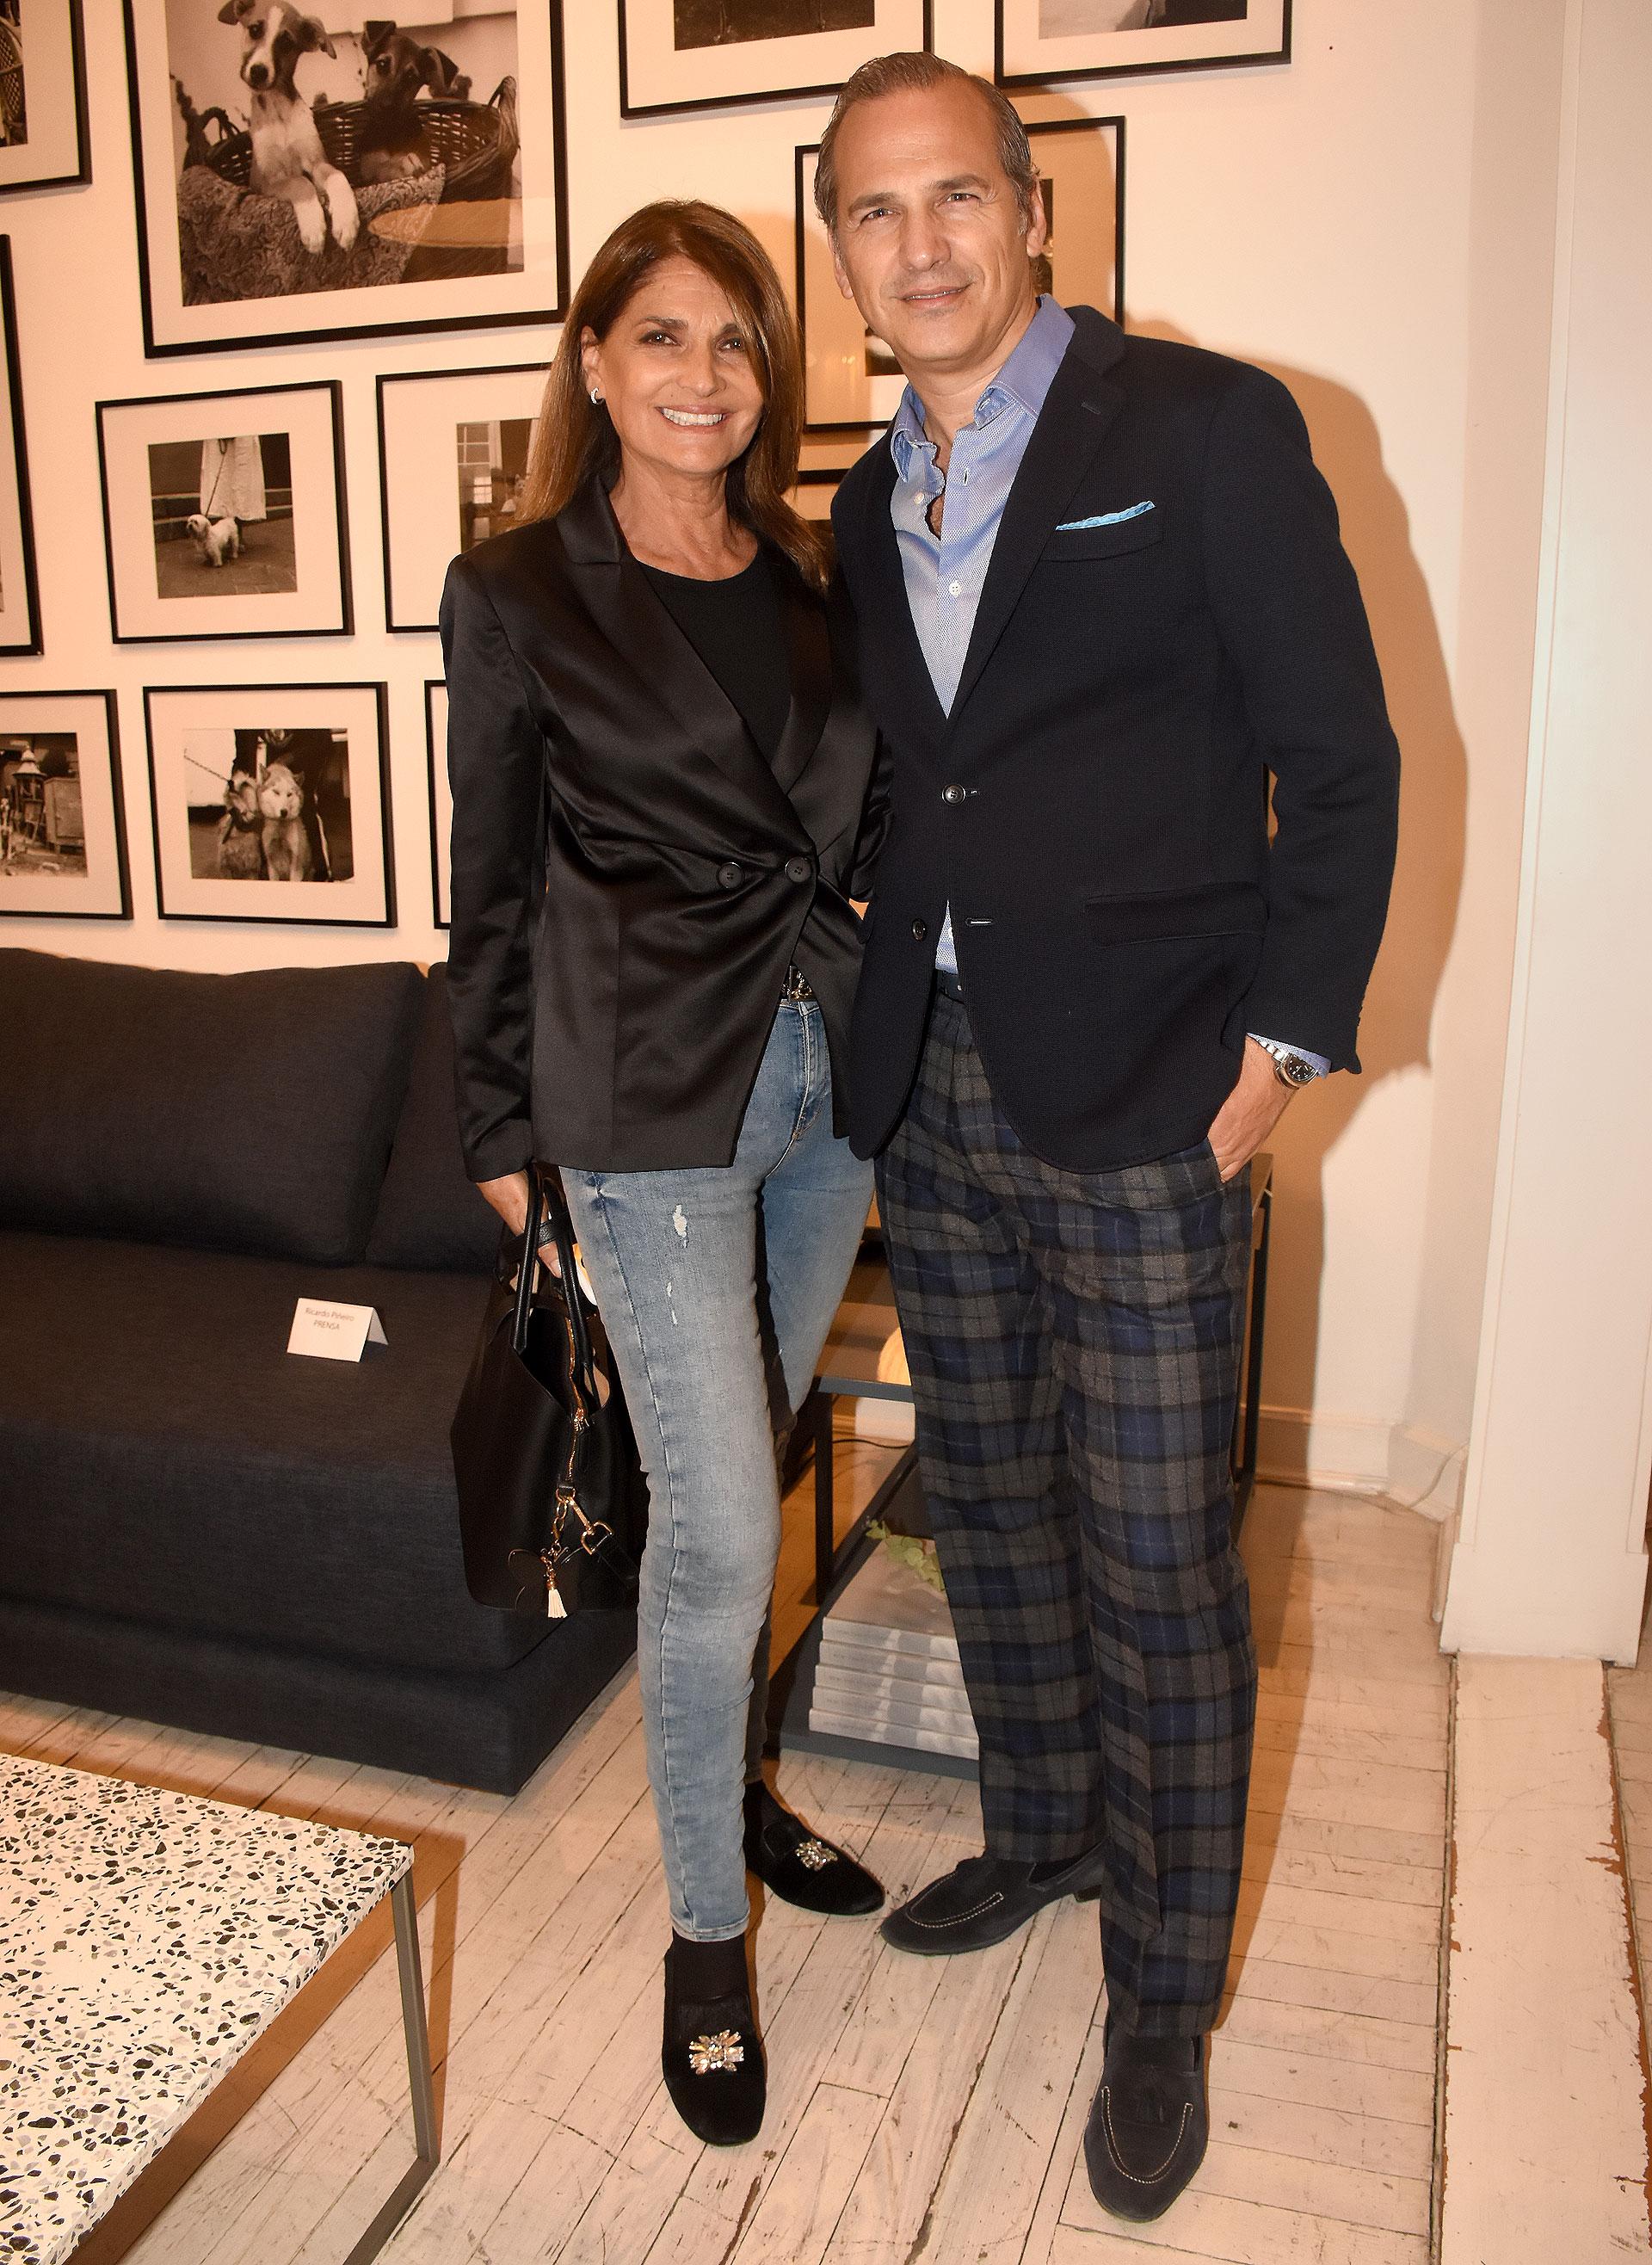 Teresa Calandra y Javier Iturrioz